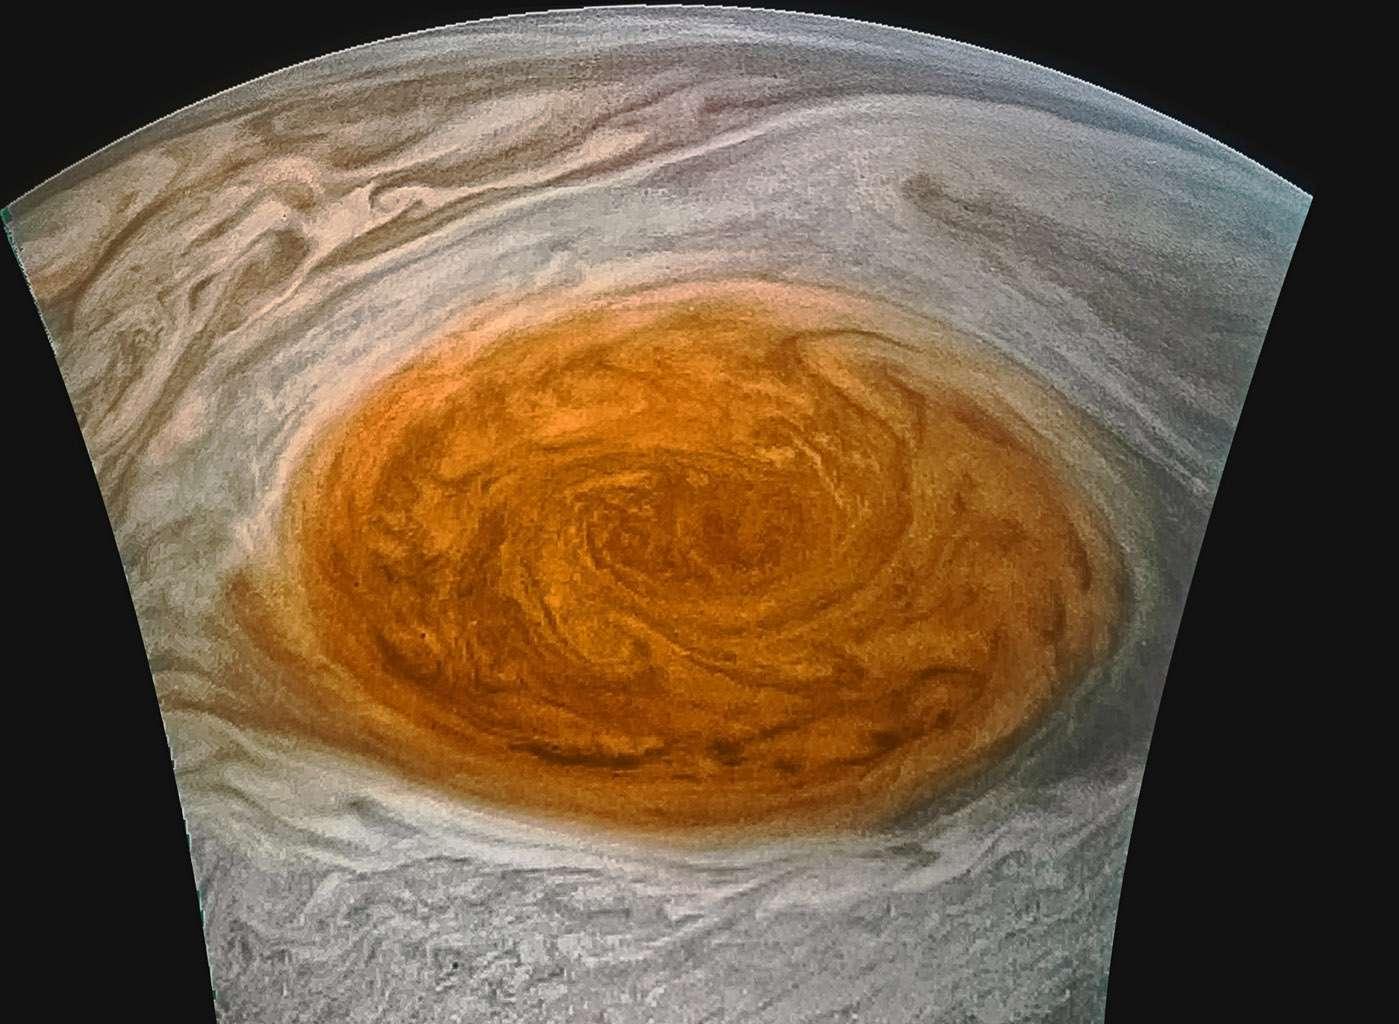 enhanced image of Jupiter's great red spot taken with JunoCam